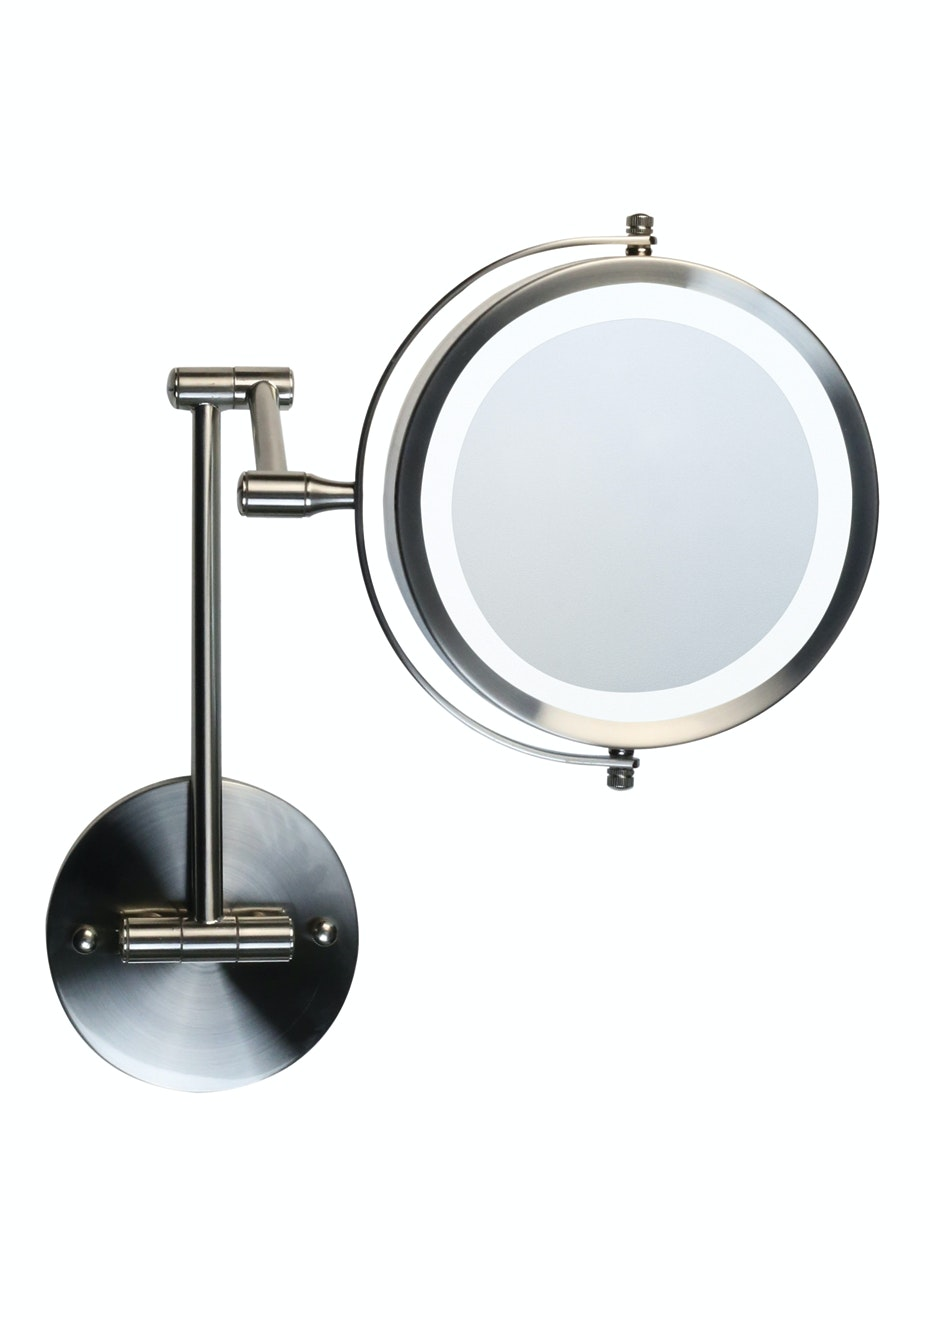 Homedics LED illuminated make up mirror - Wall mounted (battery only)